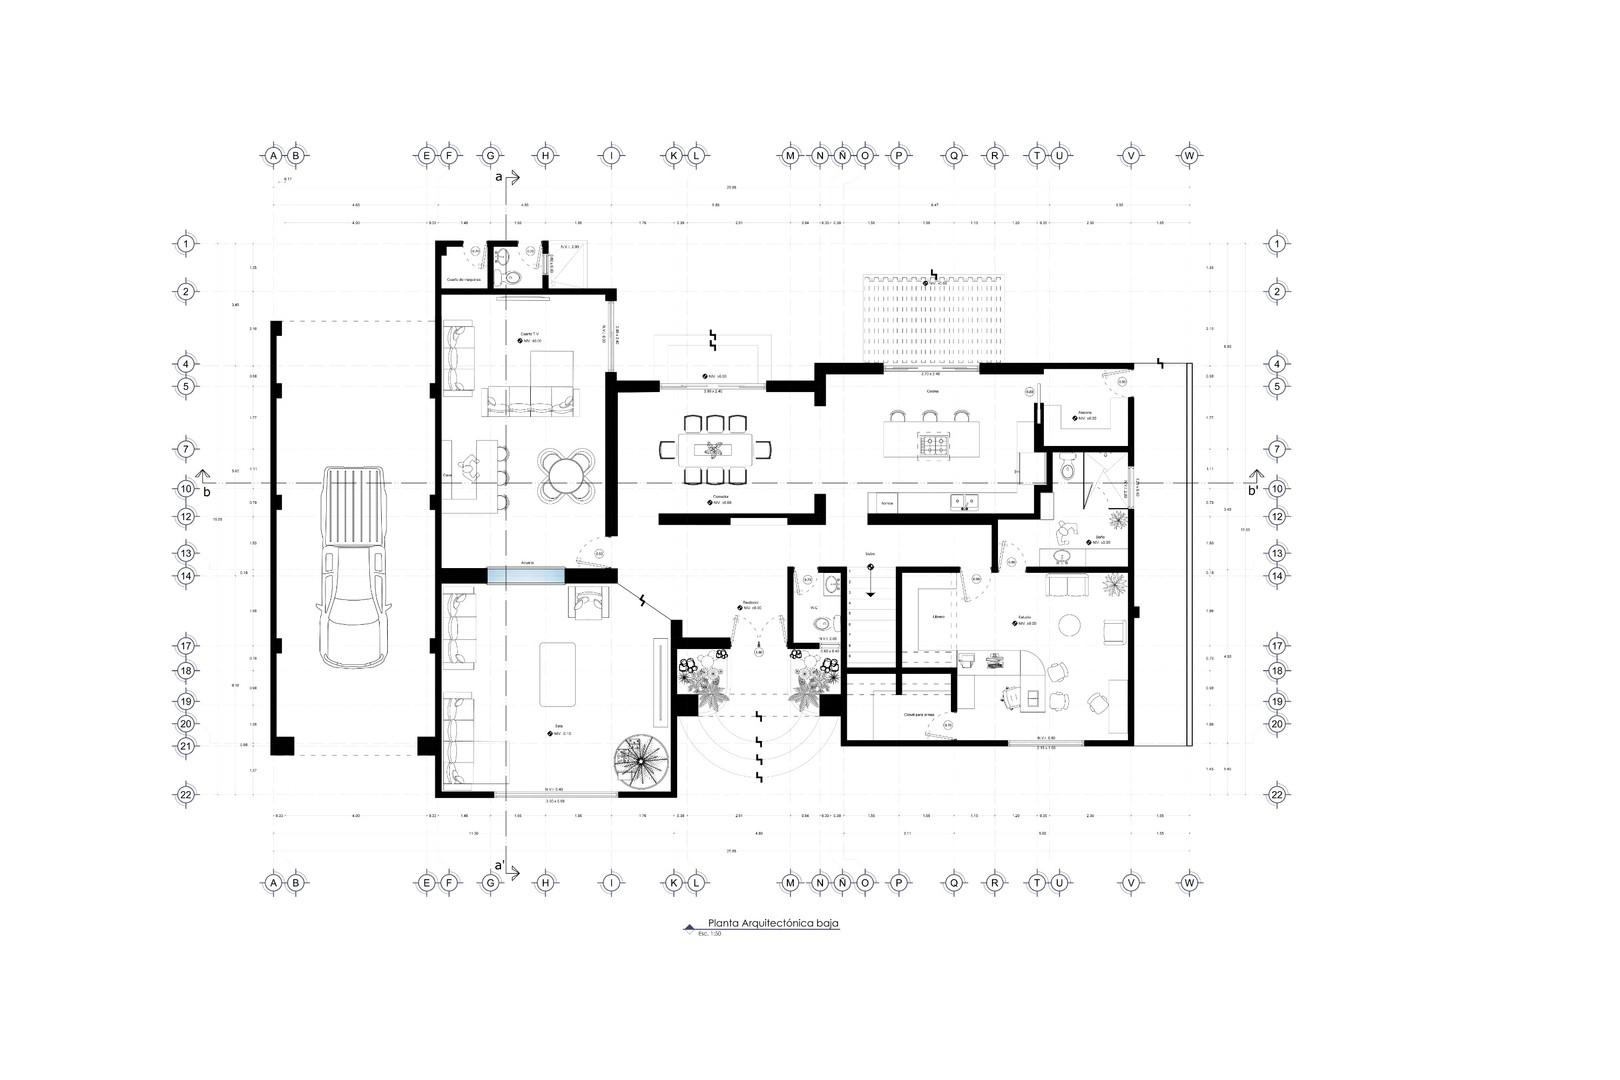 Arquitectonico%20eric%20omarl%20-01_edit